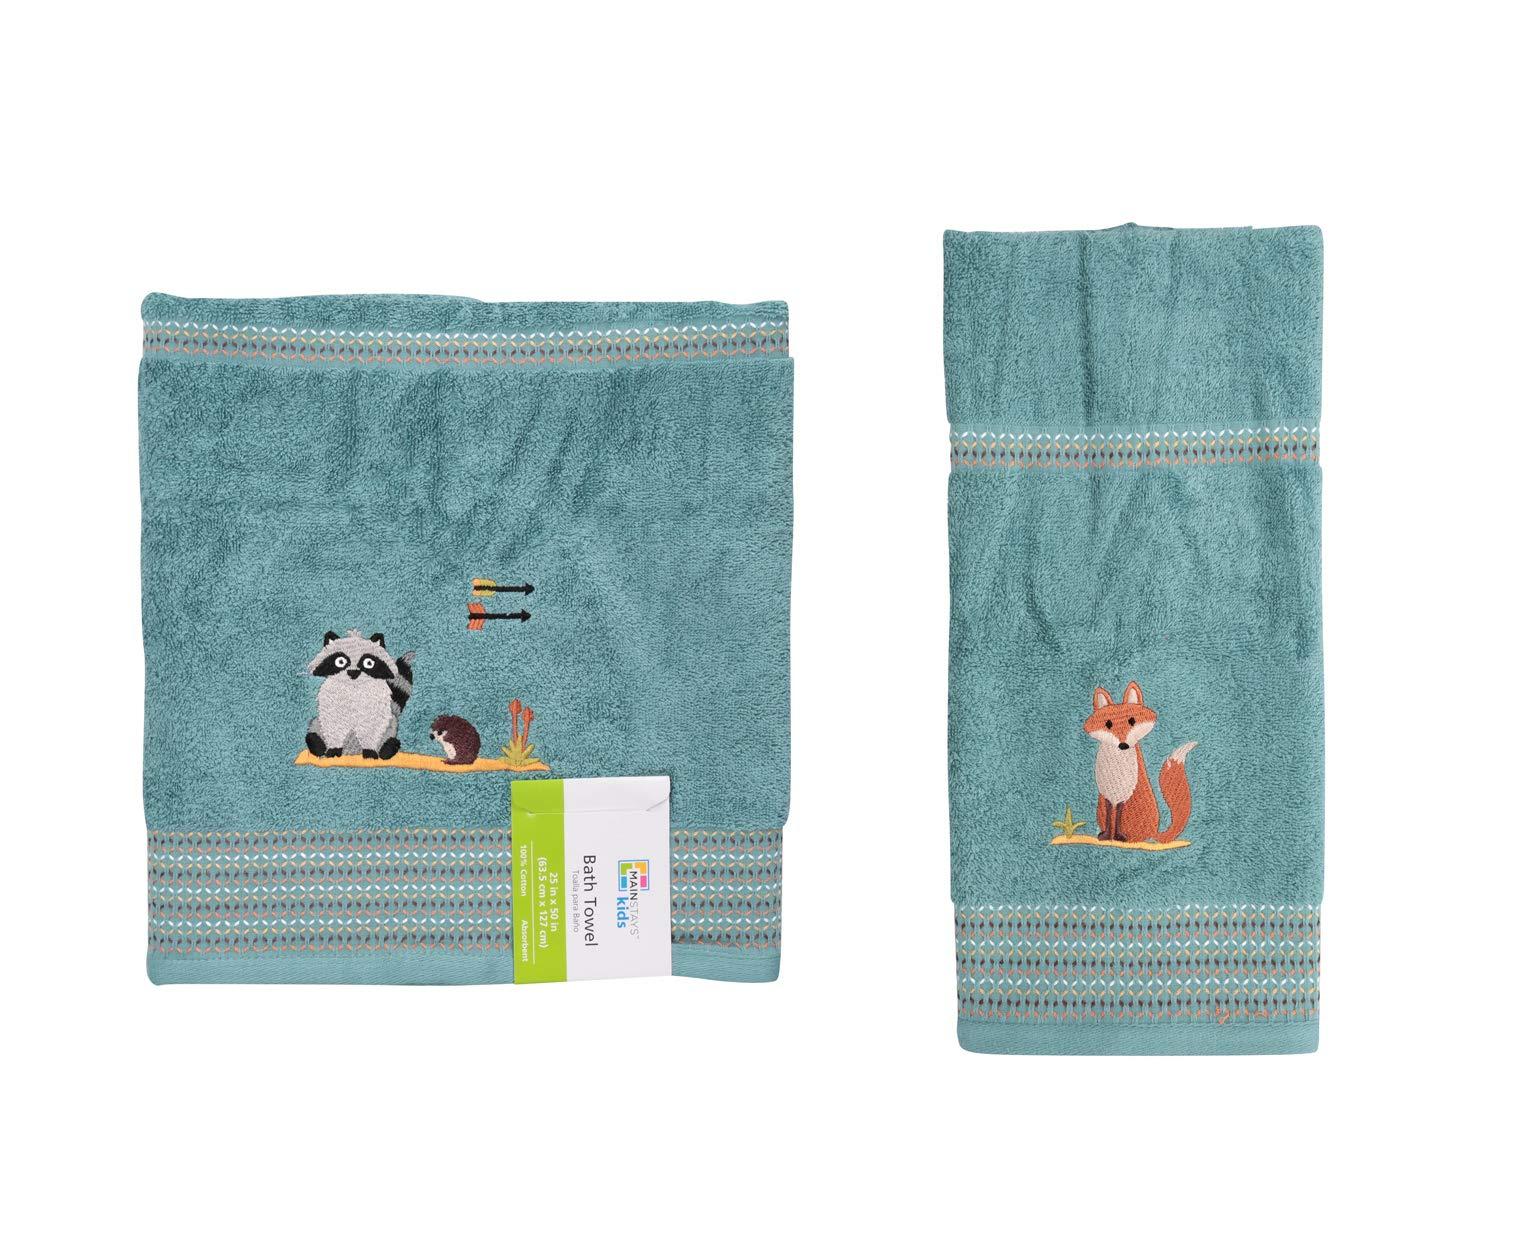 Mainstays Kids Woodland Creatures Bath Towel bundle with Mainstays Kids Woodland Creatures Hand Towel